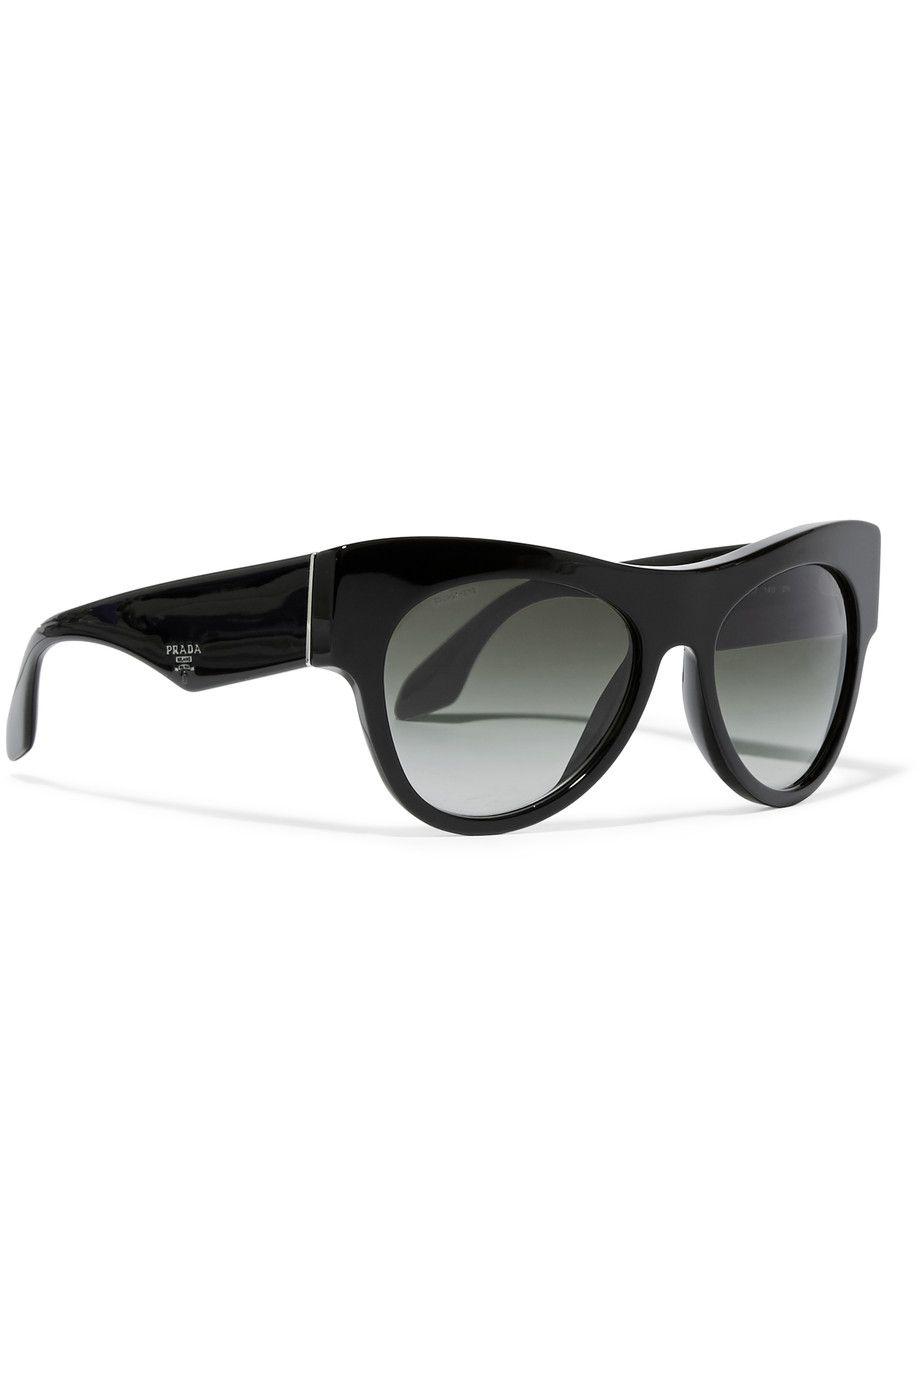 PRADA   Blak D-frame acetate sunglasses   UK   THE OUTNET   Eye ...